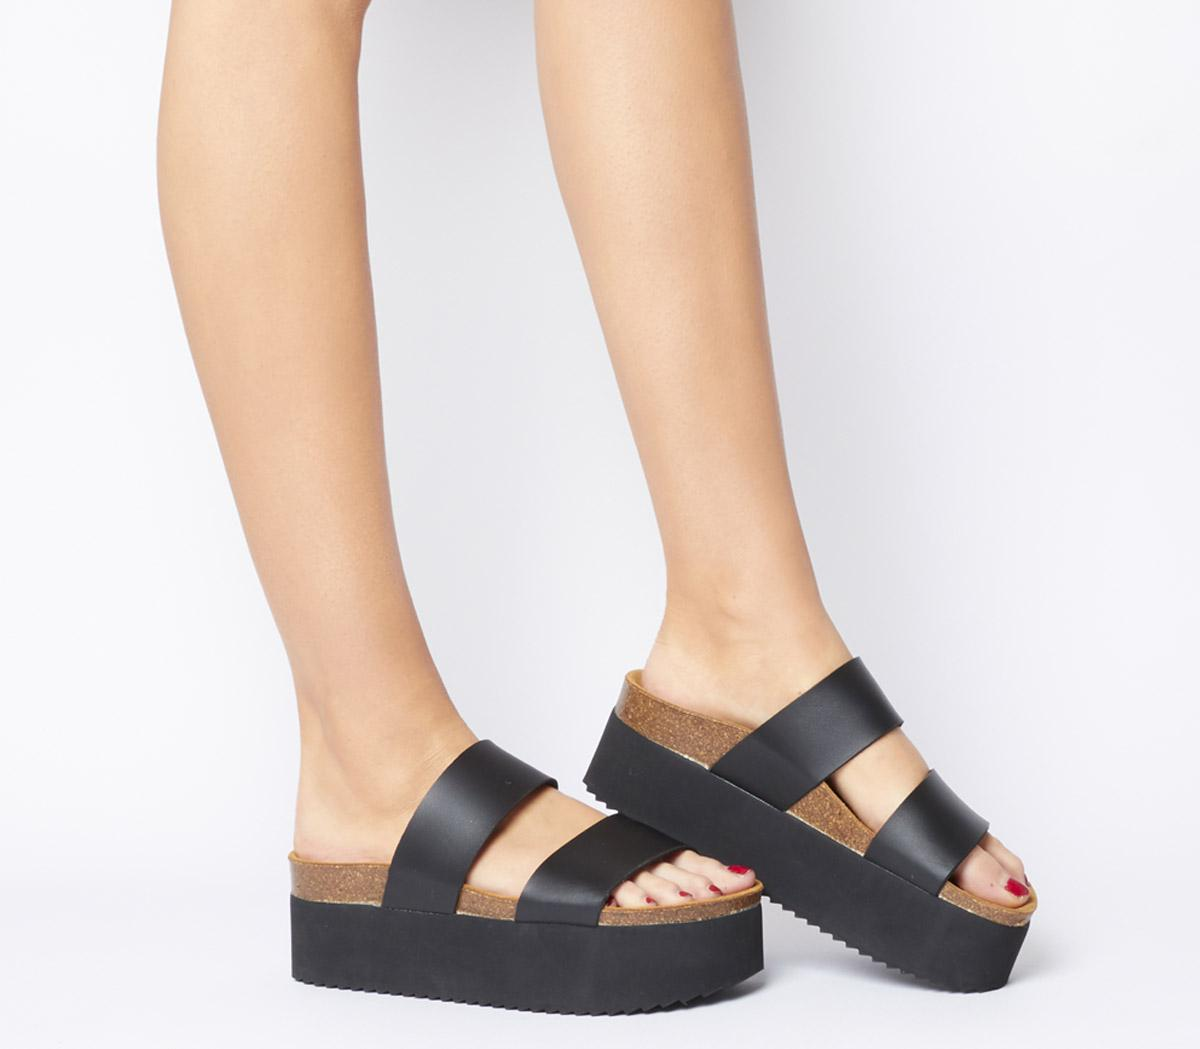 Mambo Flatform Two Strap Sandals